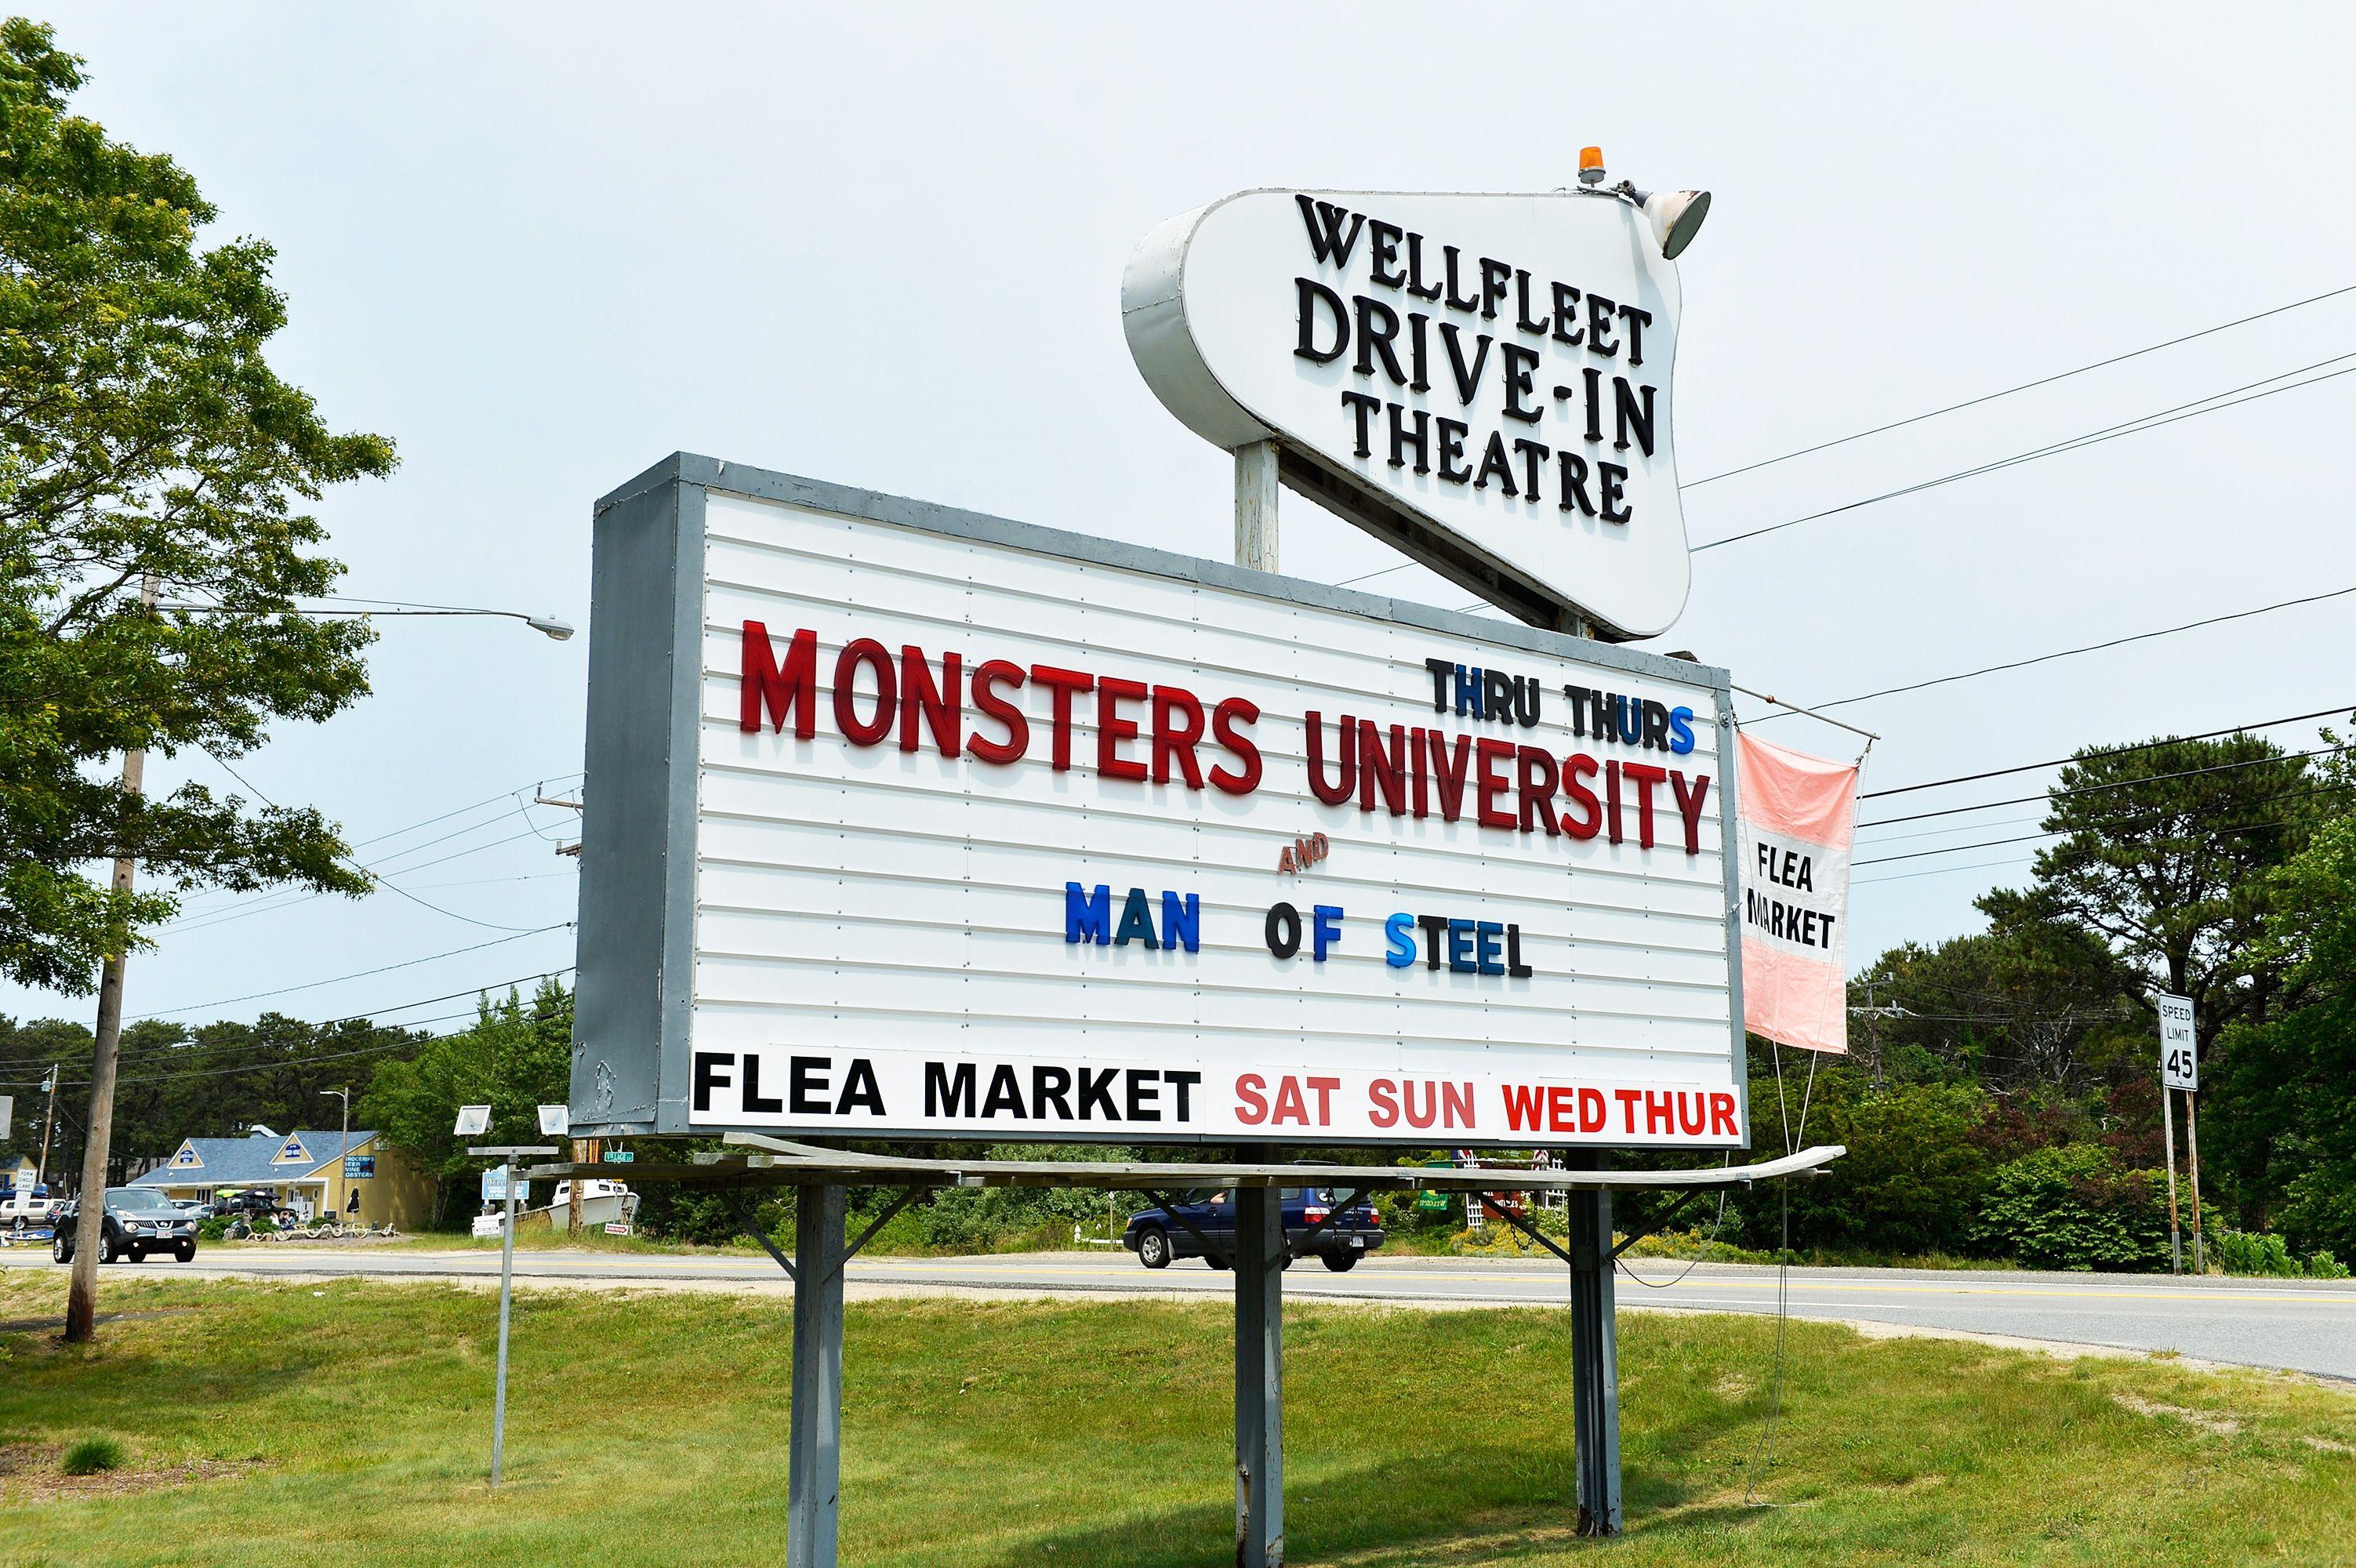 movie theater in trussville birmingham al